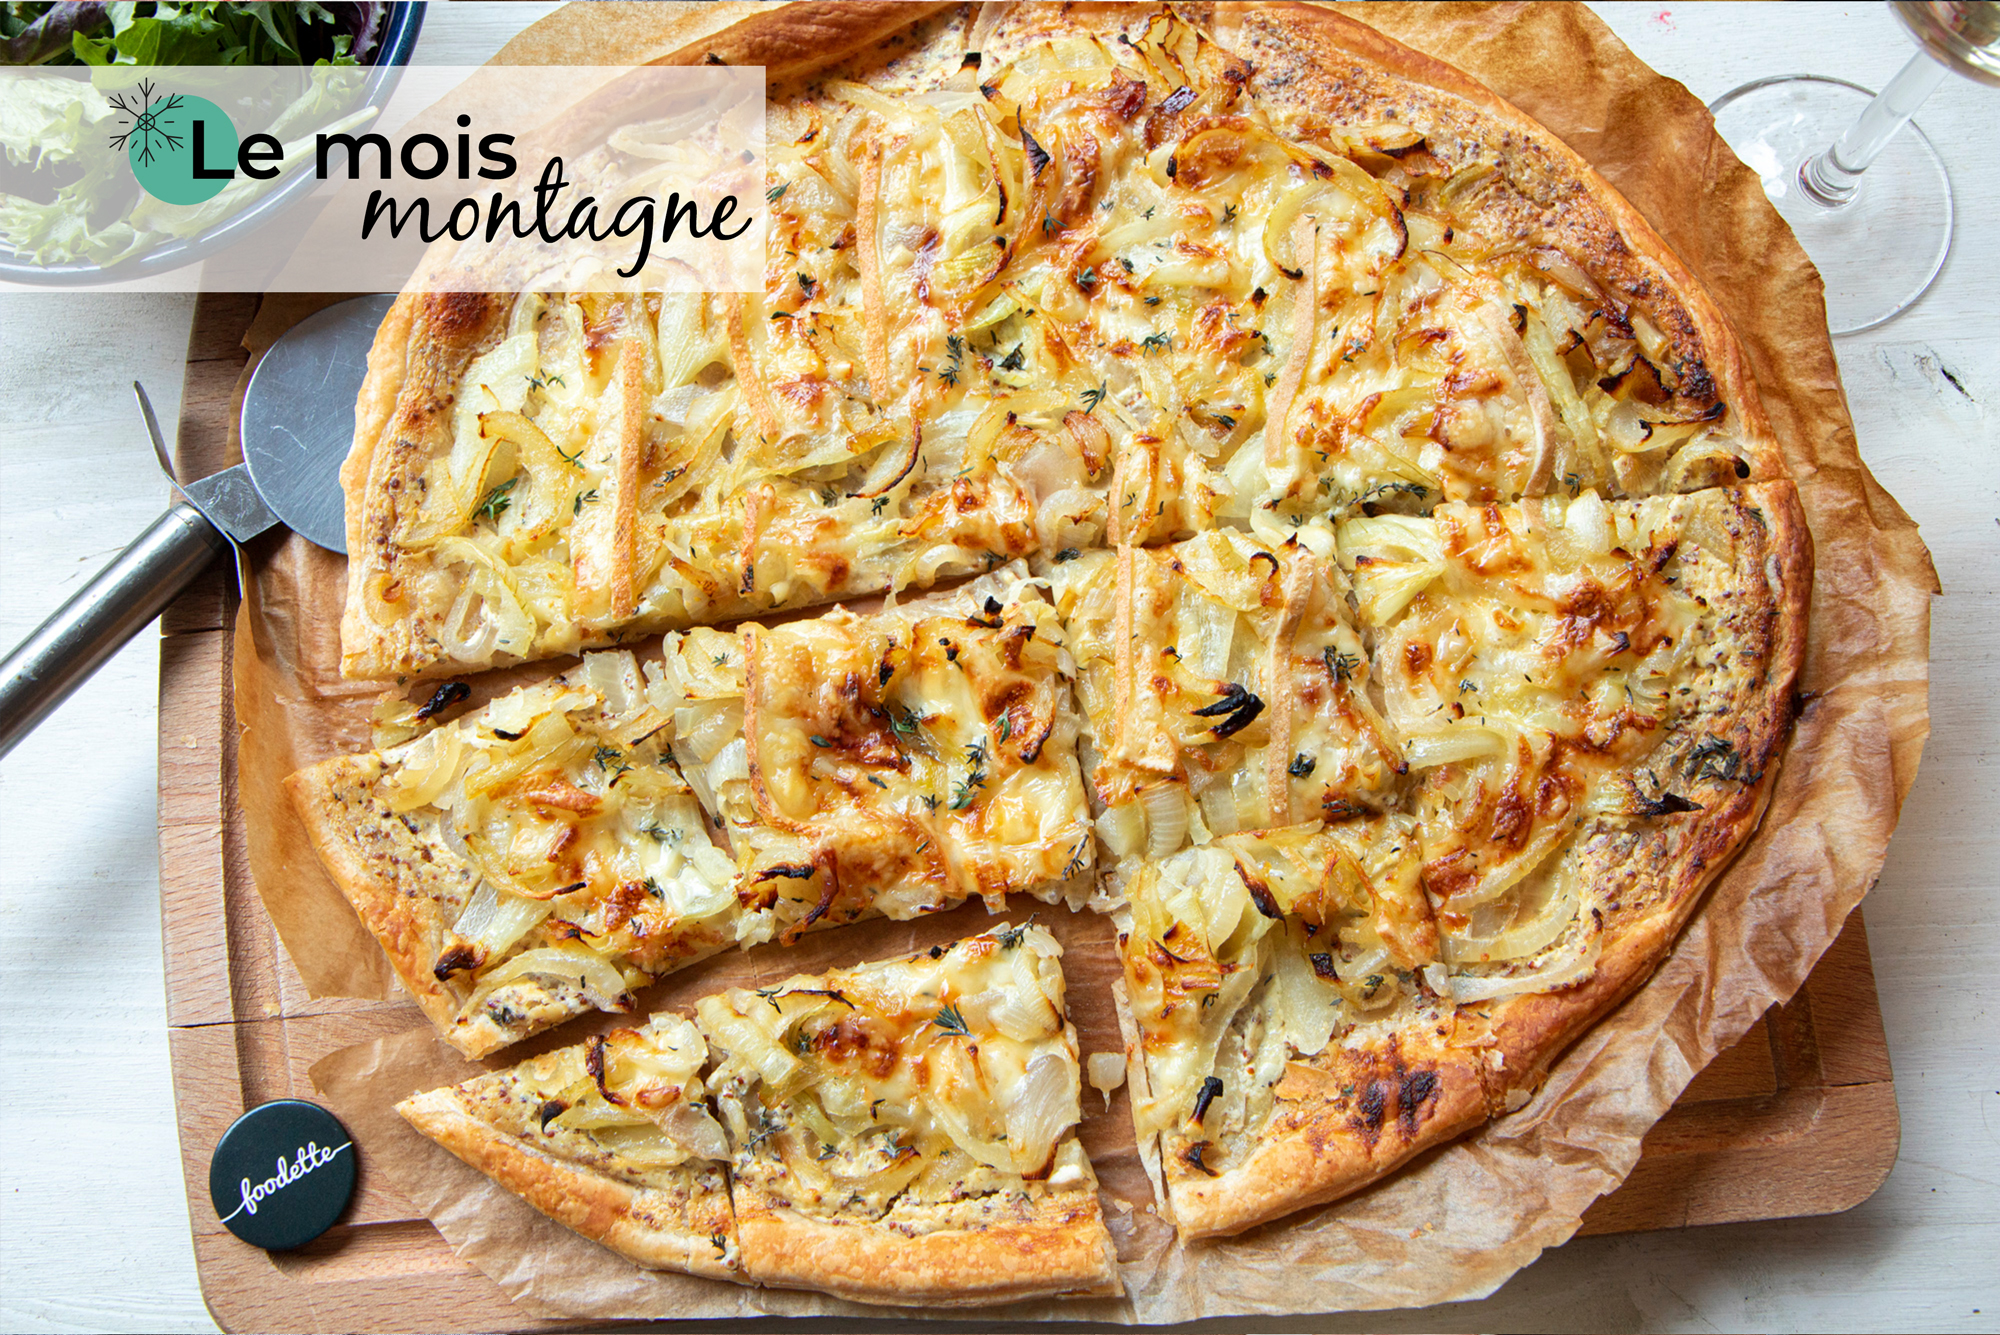 Tarte fine oignon/Raclette